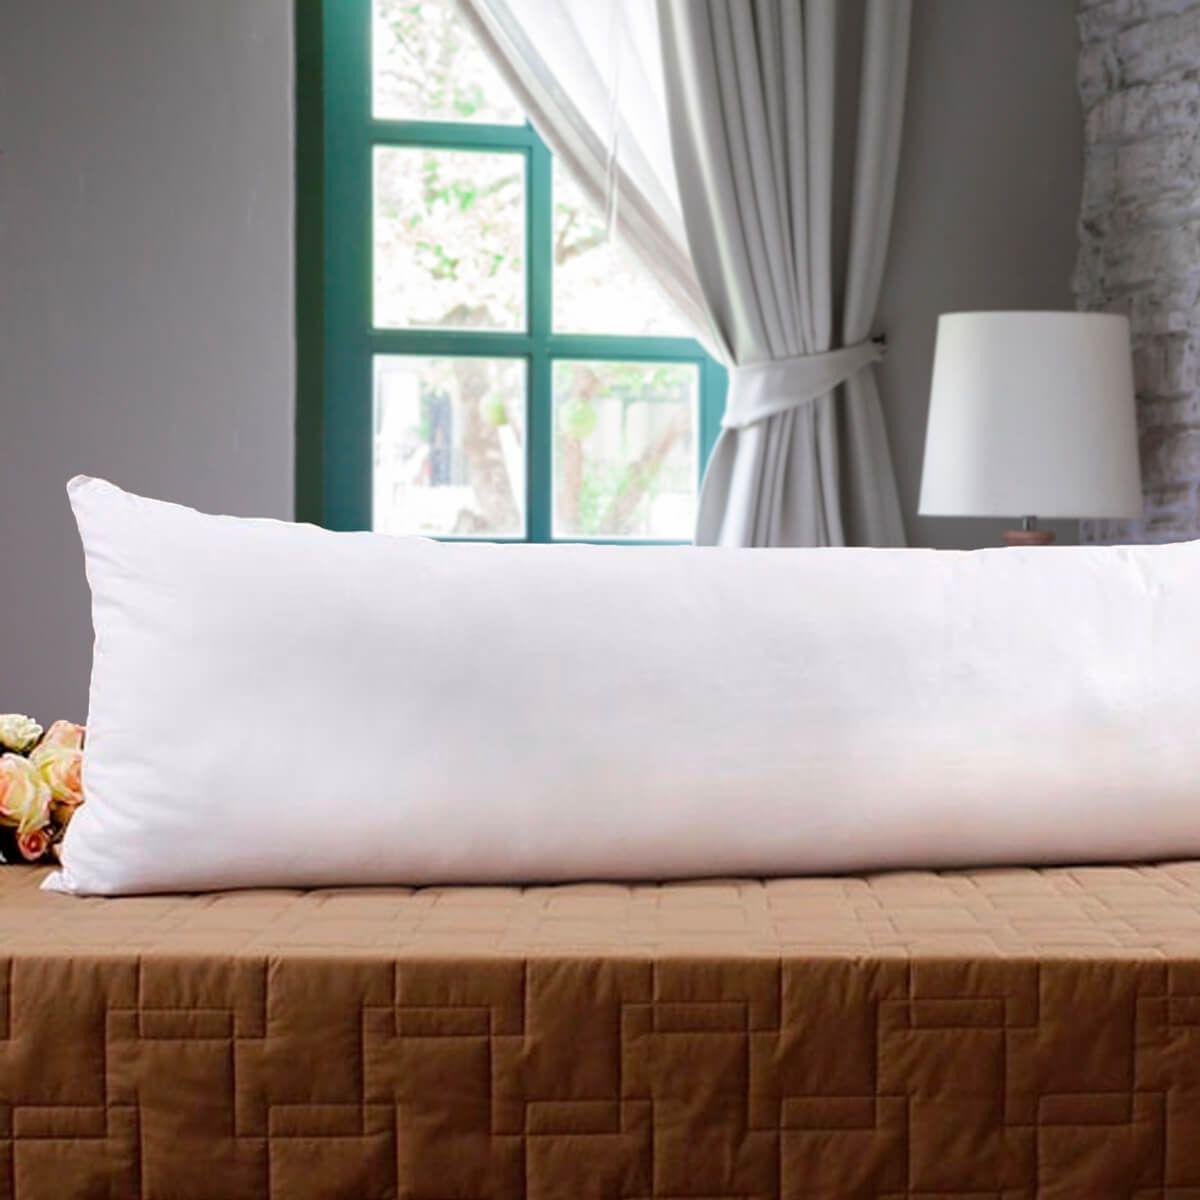 Fronha Avulsa Gigante p/ Travesseiro Corpo 0,40x1,30m Percal 180 Fios